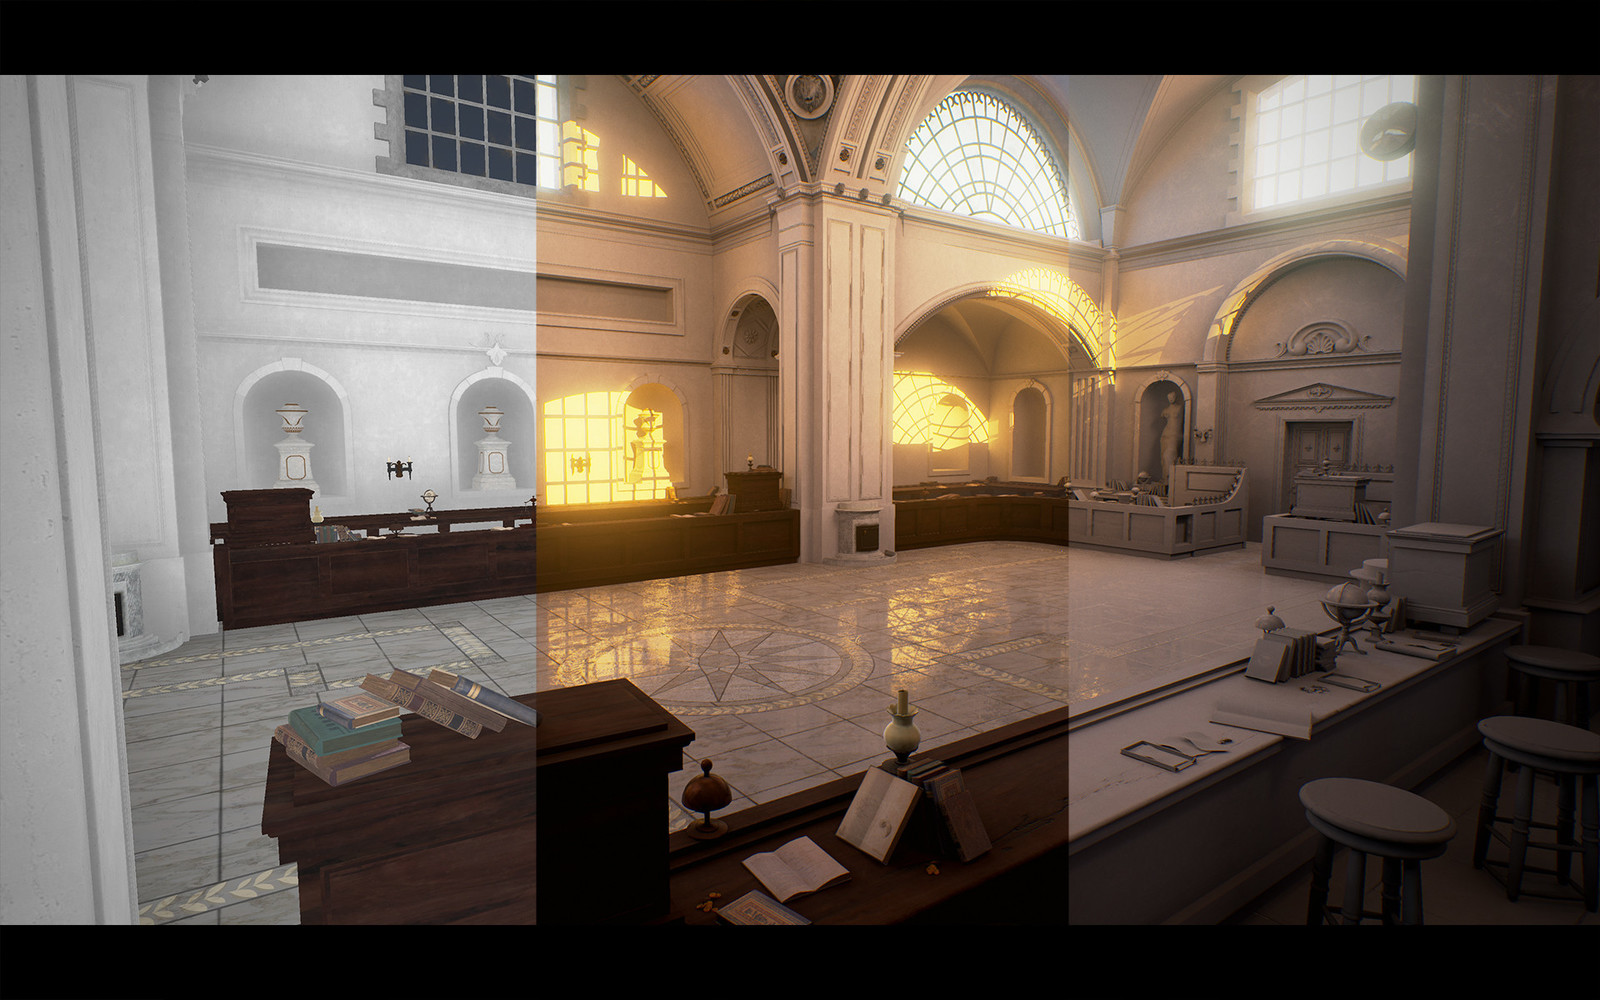 Unreal Engine 4 Breakdown / Room Angle